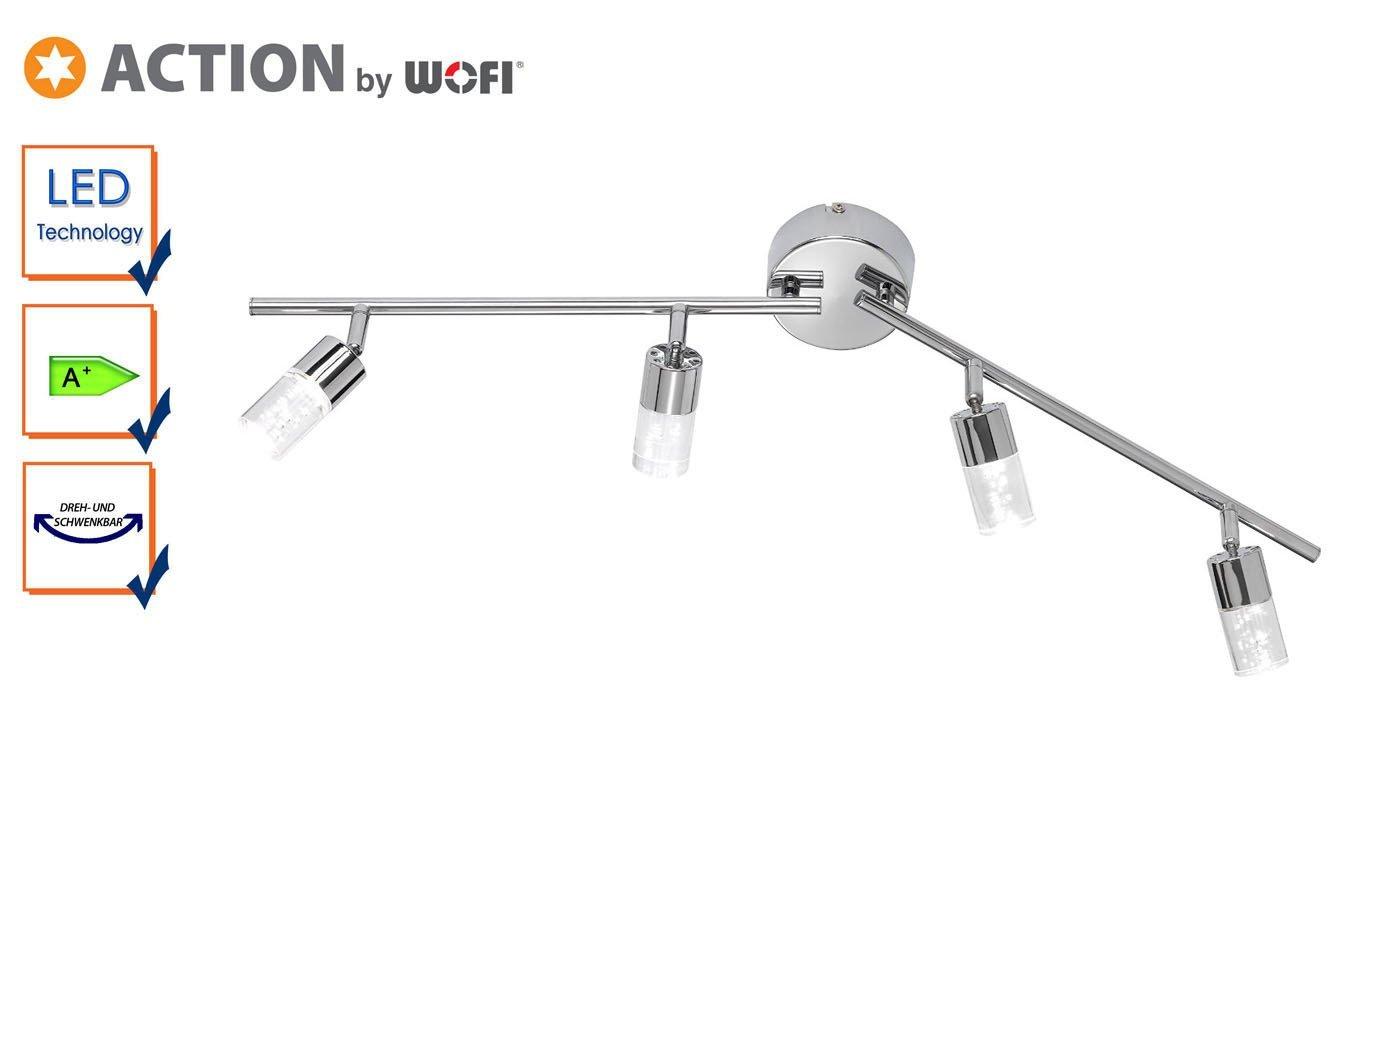 Action vigas, 4-lámpara de aluminio 4 x LED/5 W, 9 x 18, 5 x 90 cm, 3000 K, 400 lm, eficiencia energética de clase a vigas +, 4-lámpara de techo Cristal ...